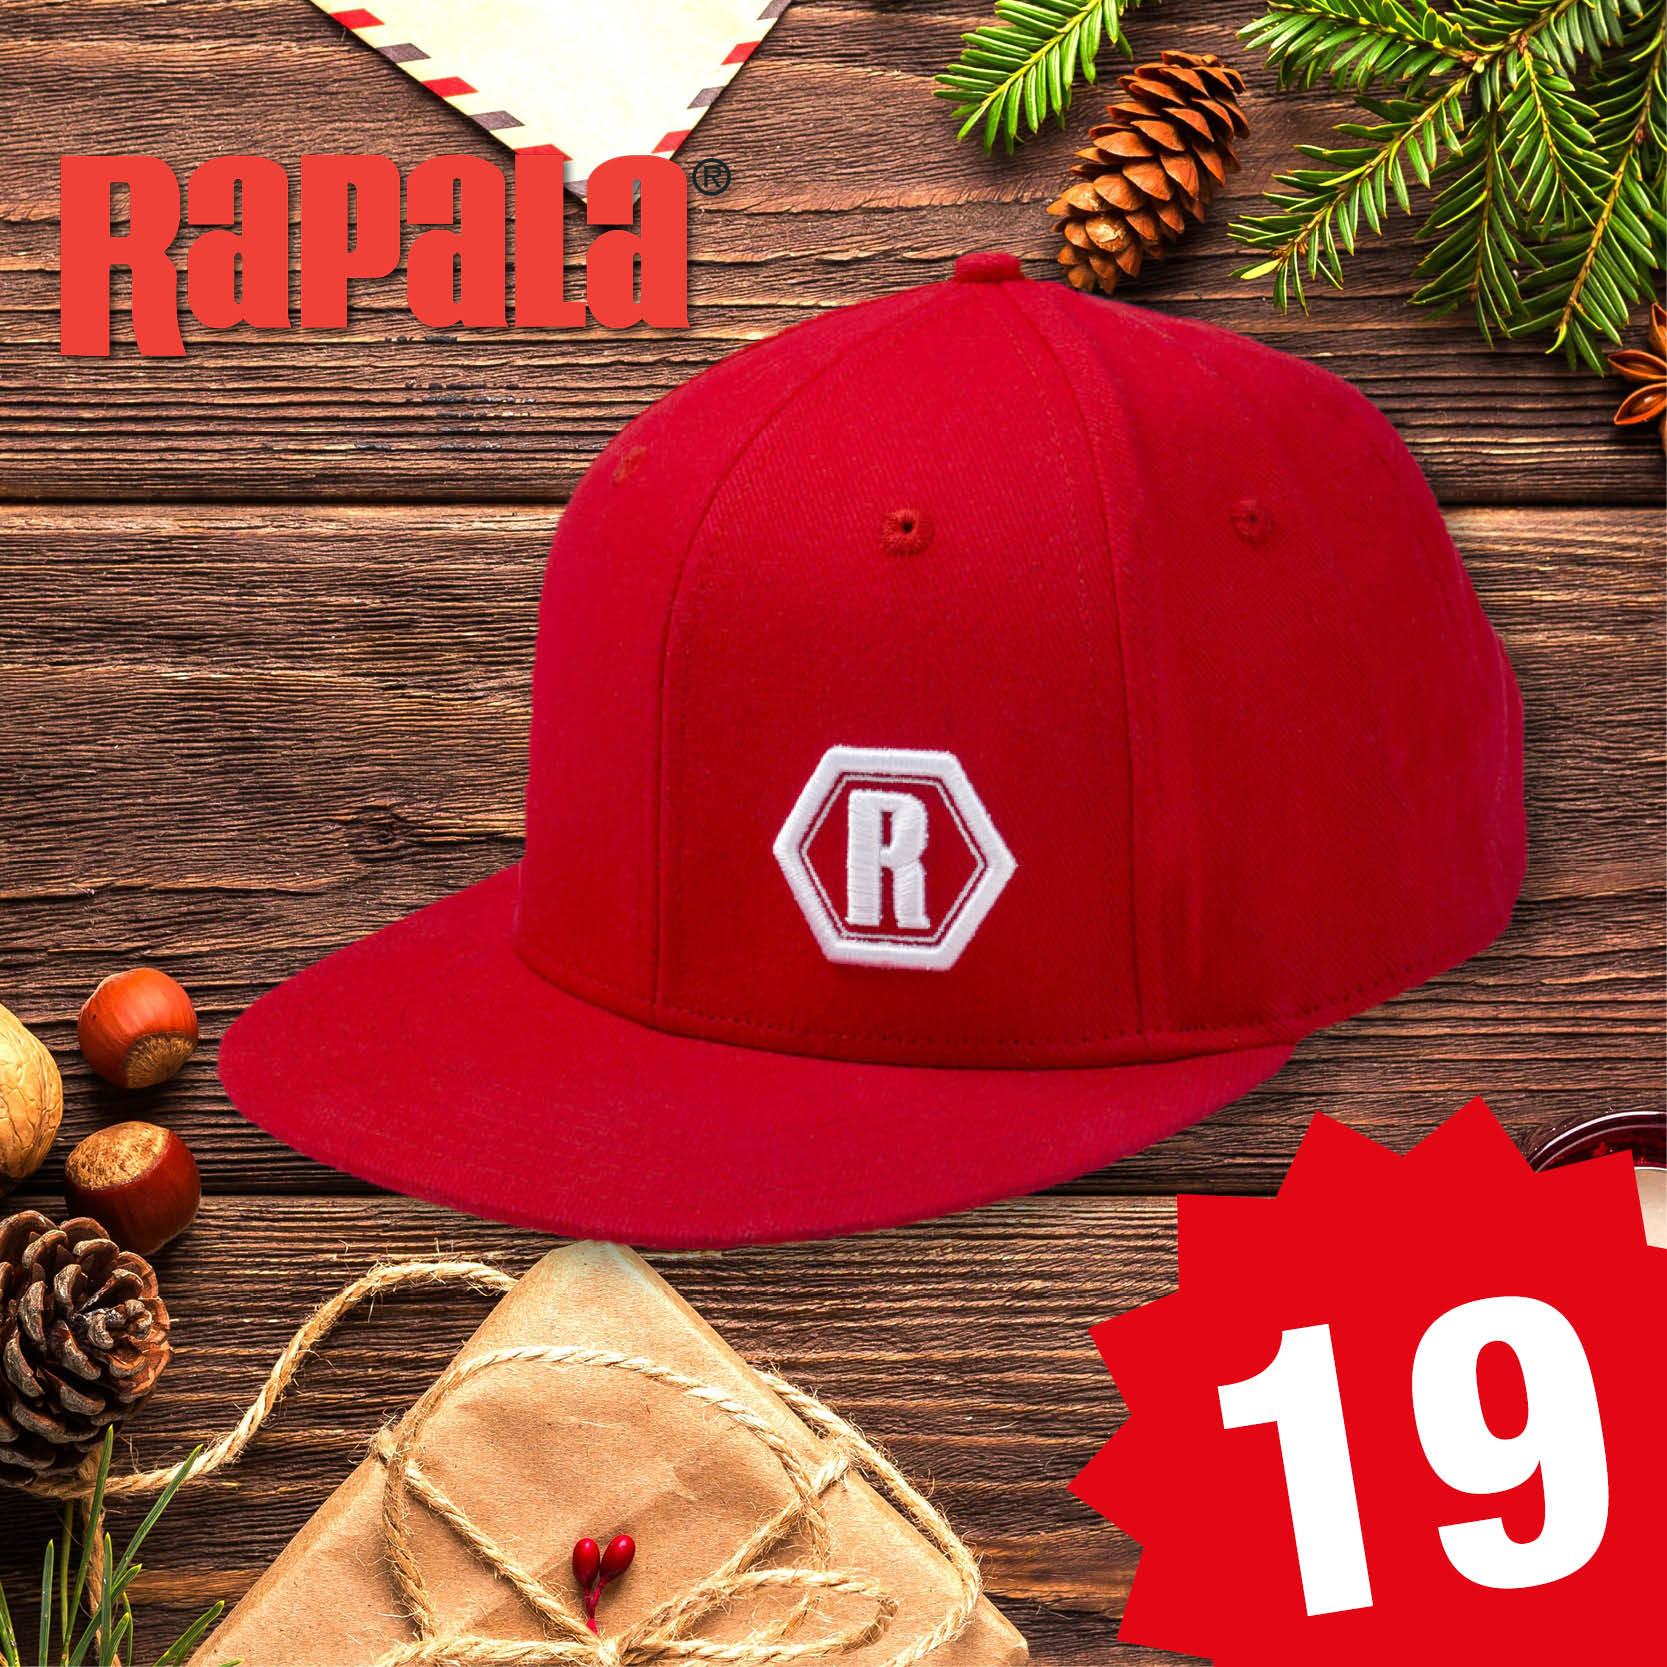 RR_Anglerboard_facebook_Quadrate_Adventkalender_19.jpg